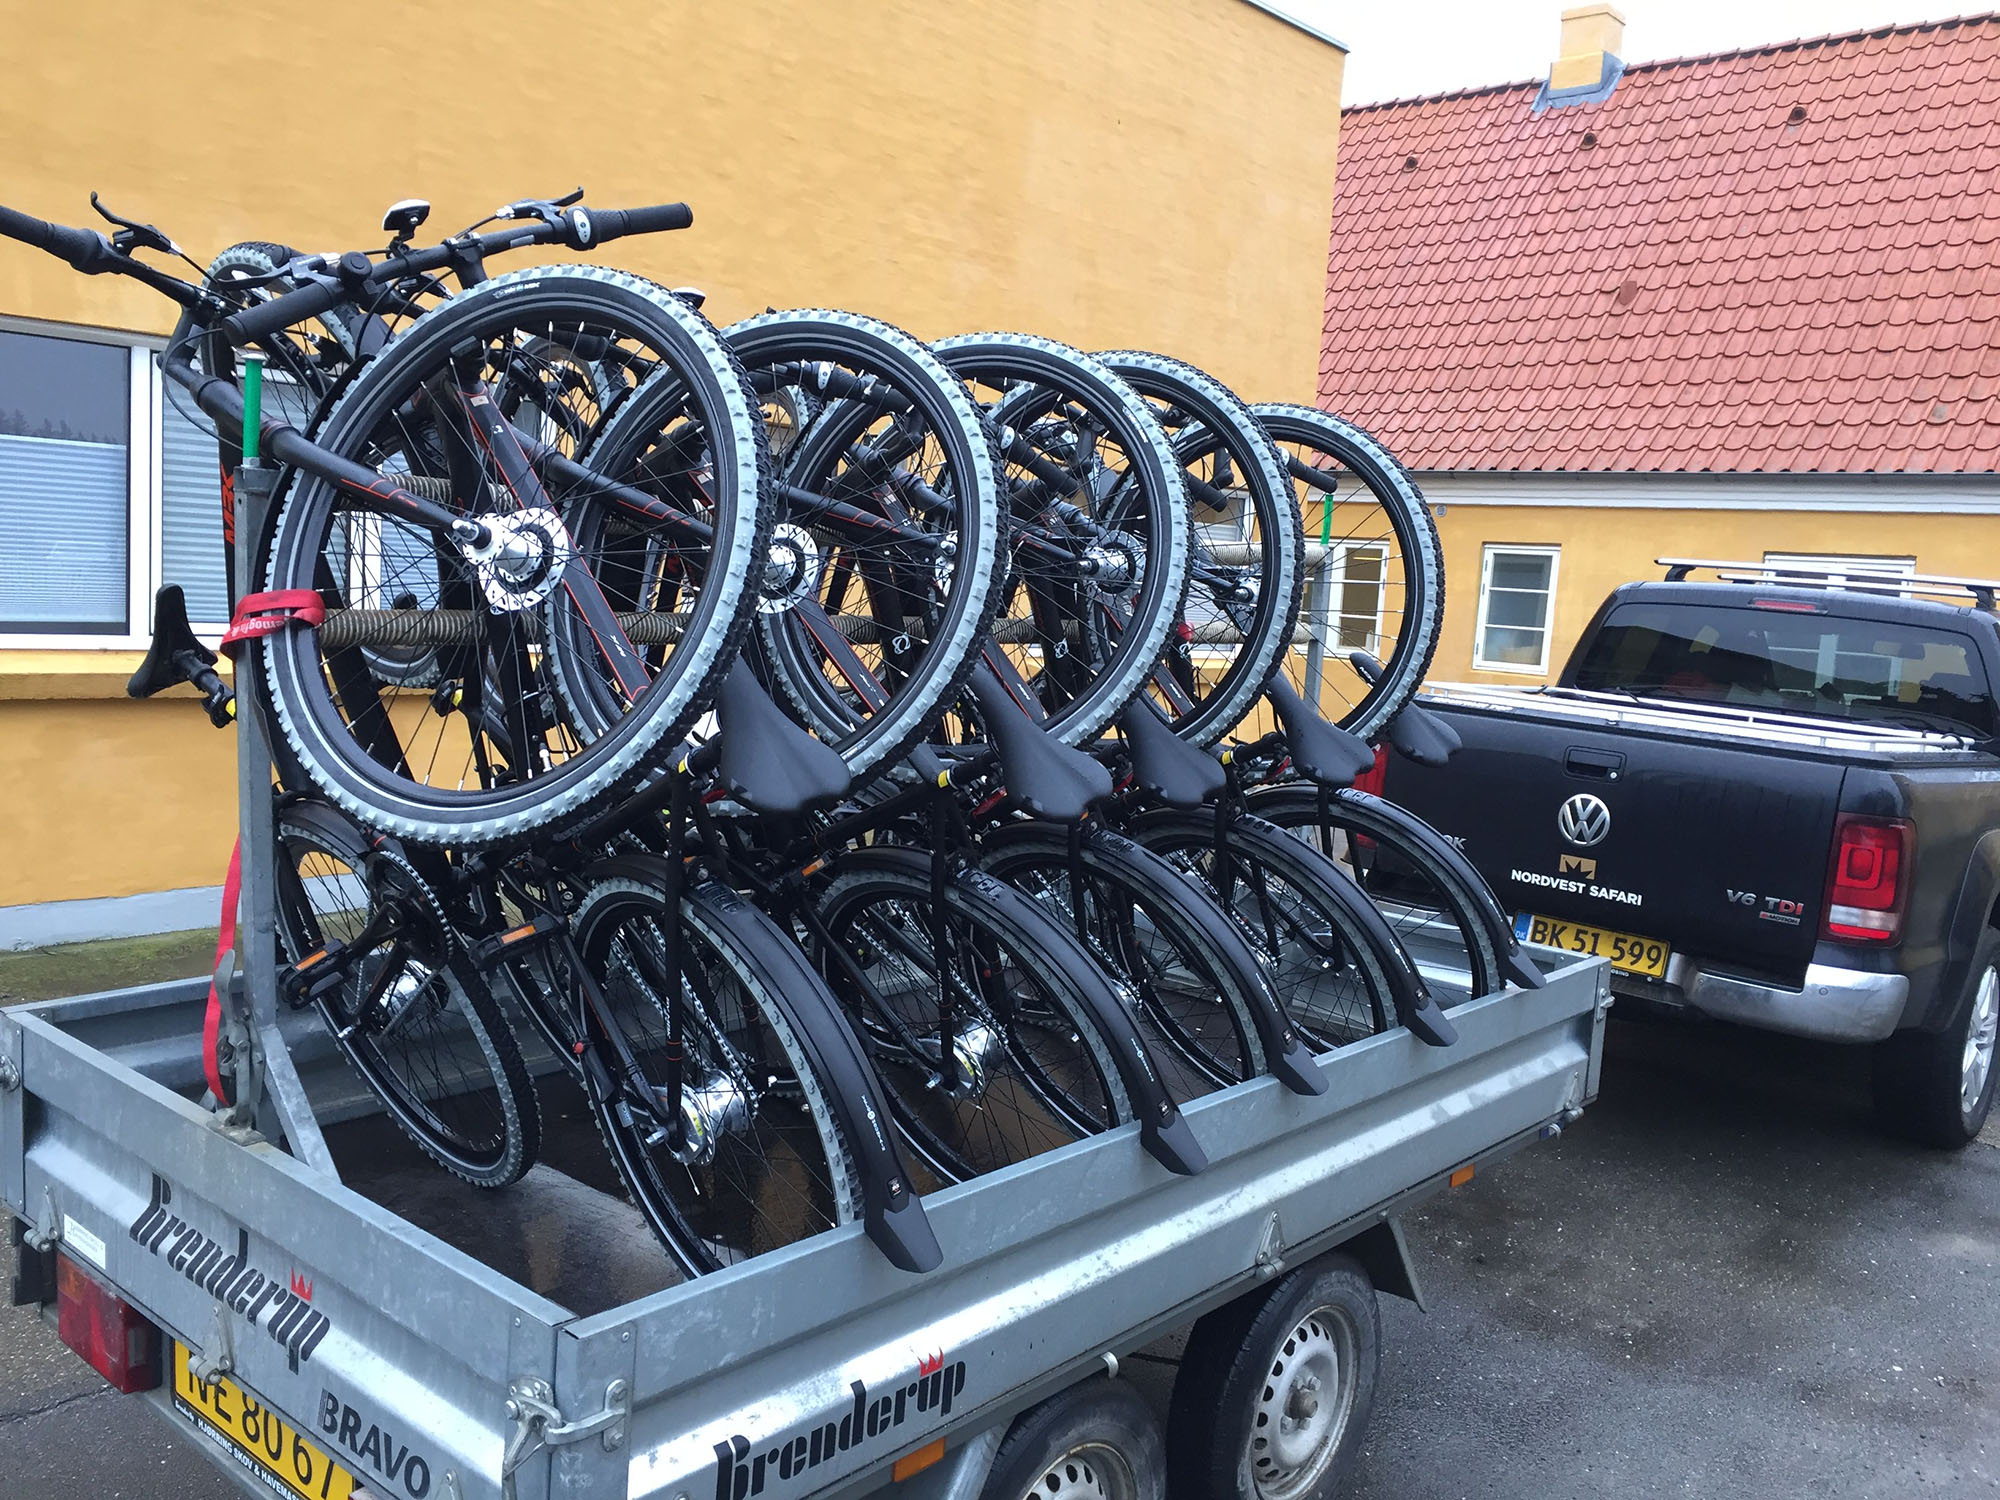 MBK cykler 02.jpg